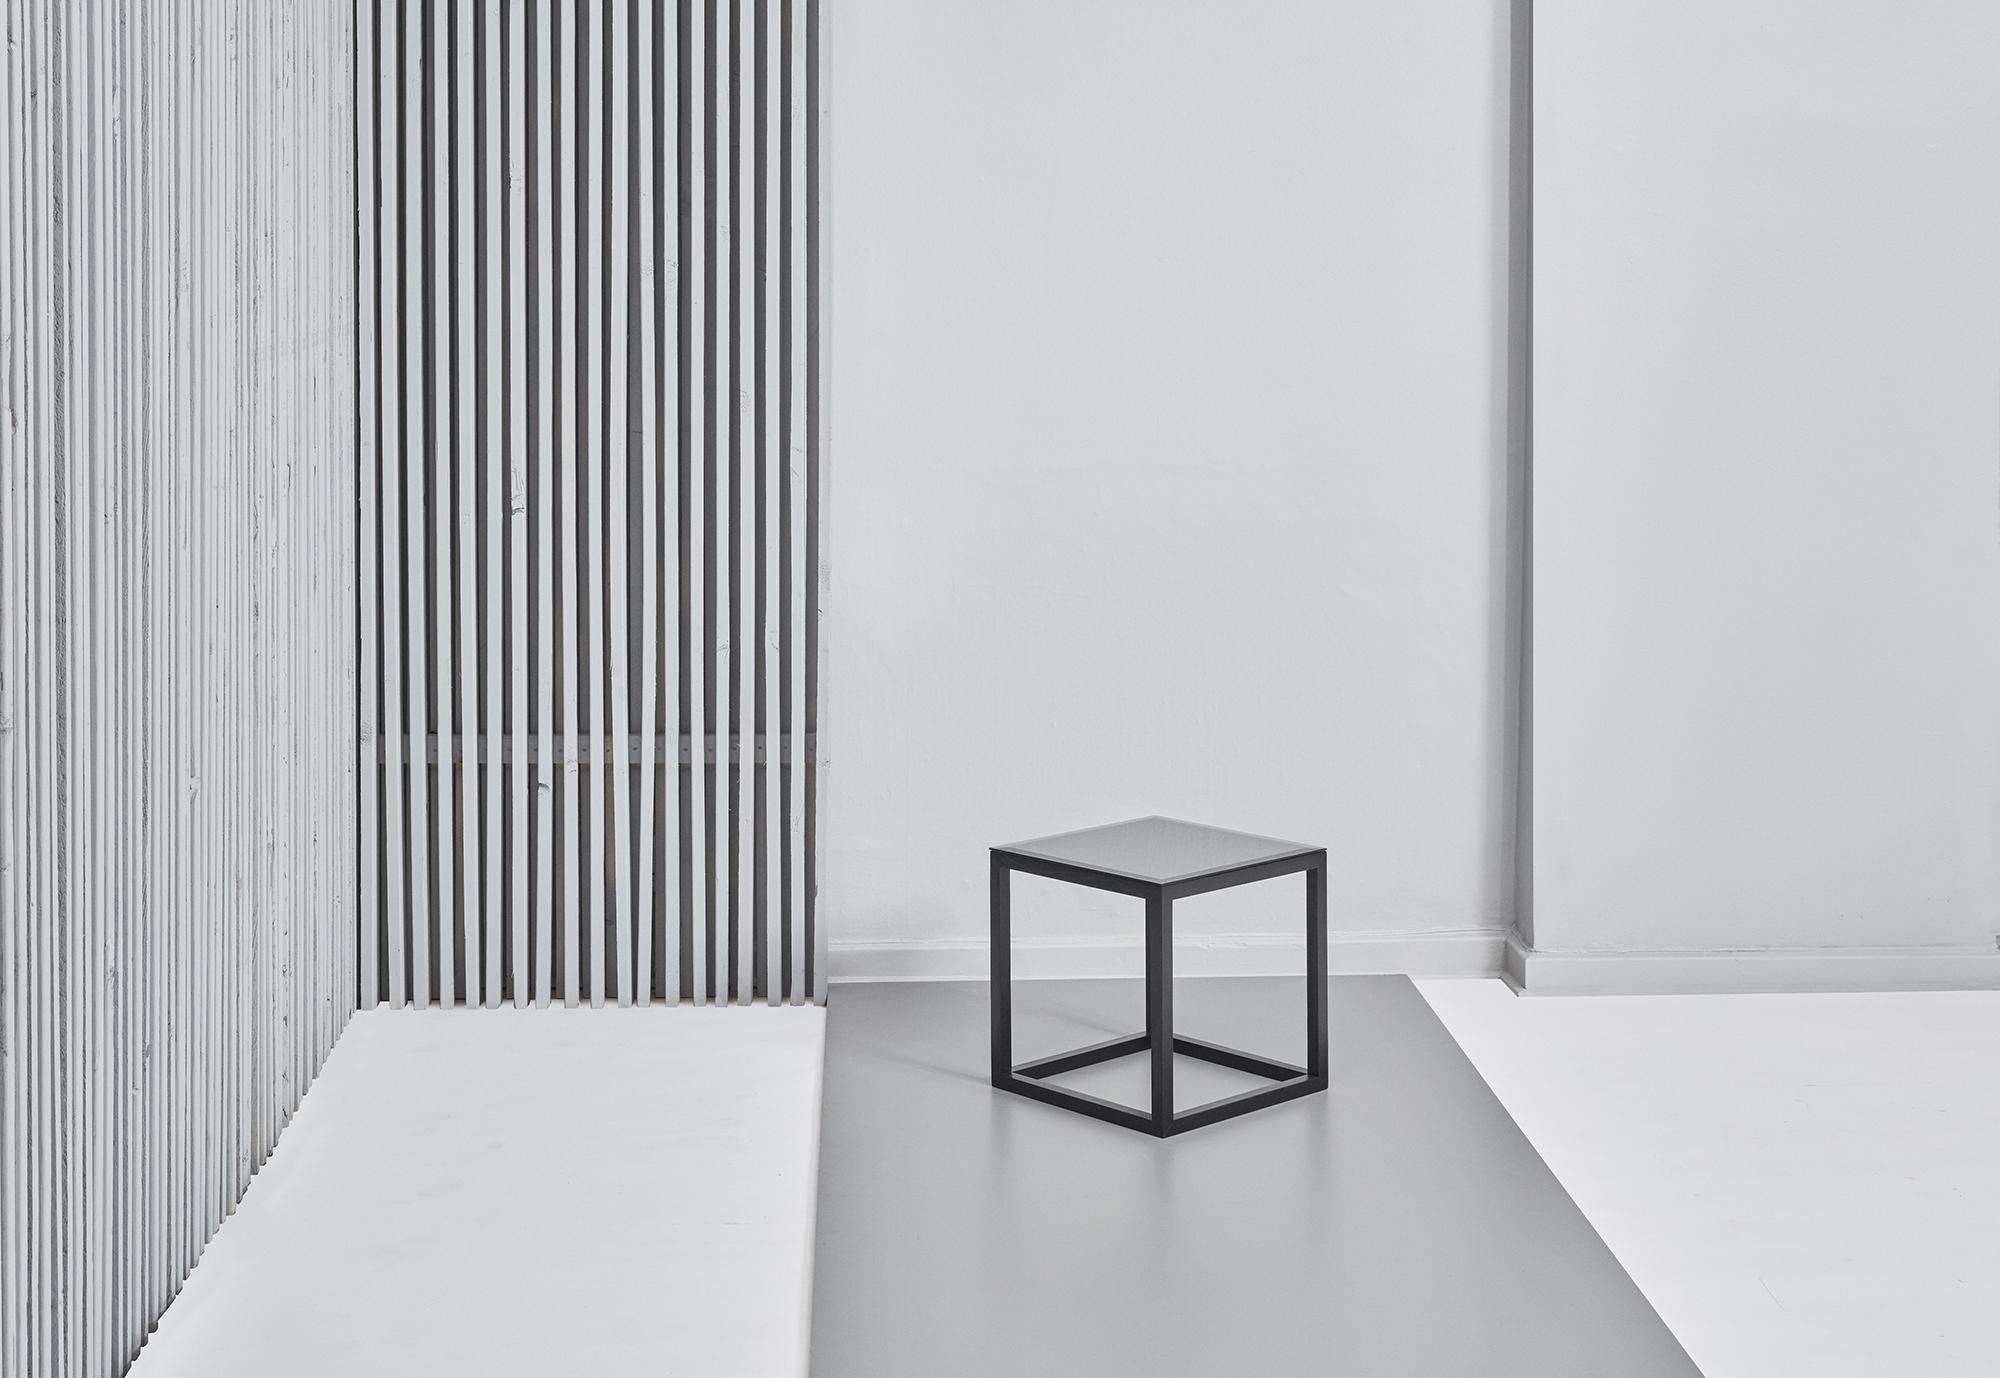 7.KristinaDamStudio-SS16_cube_table_mirror.jpg